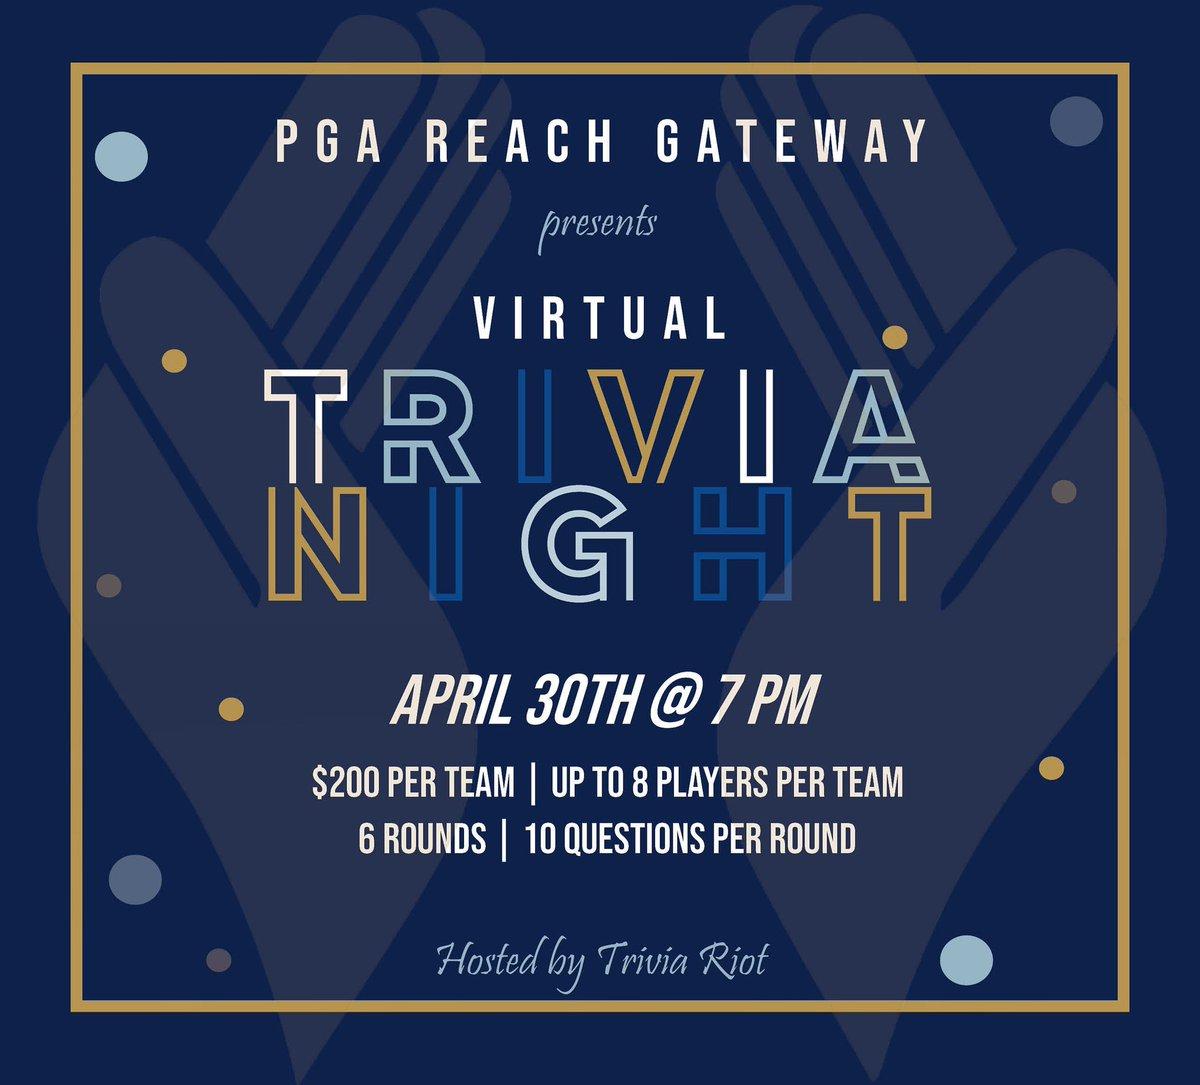 Sign up a team and join PGA REACH Gateway for the 2021 Virtual Trivia Night!   #trivianight #stl #gatewaypga #pgareachgateway